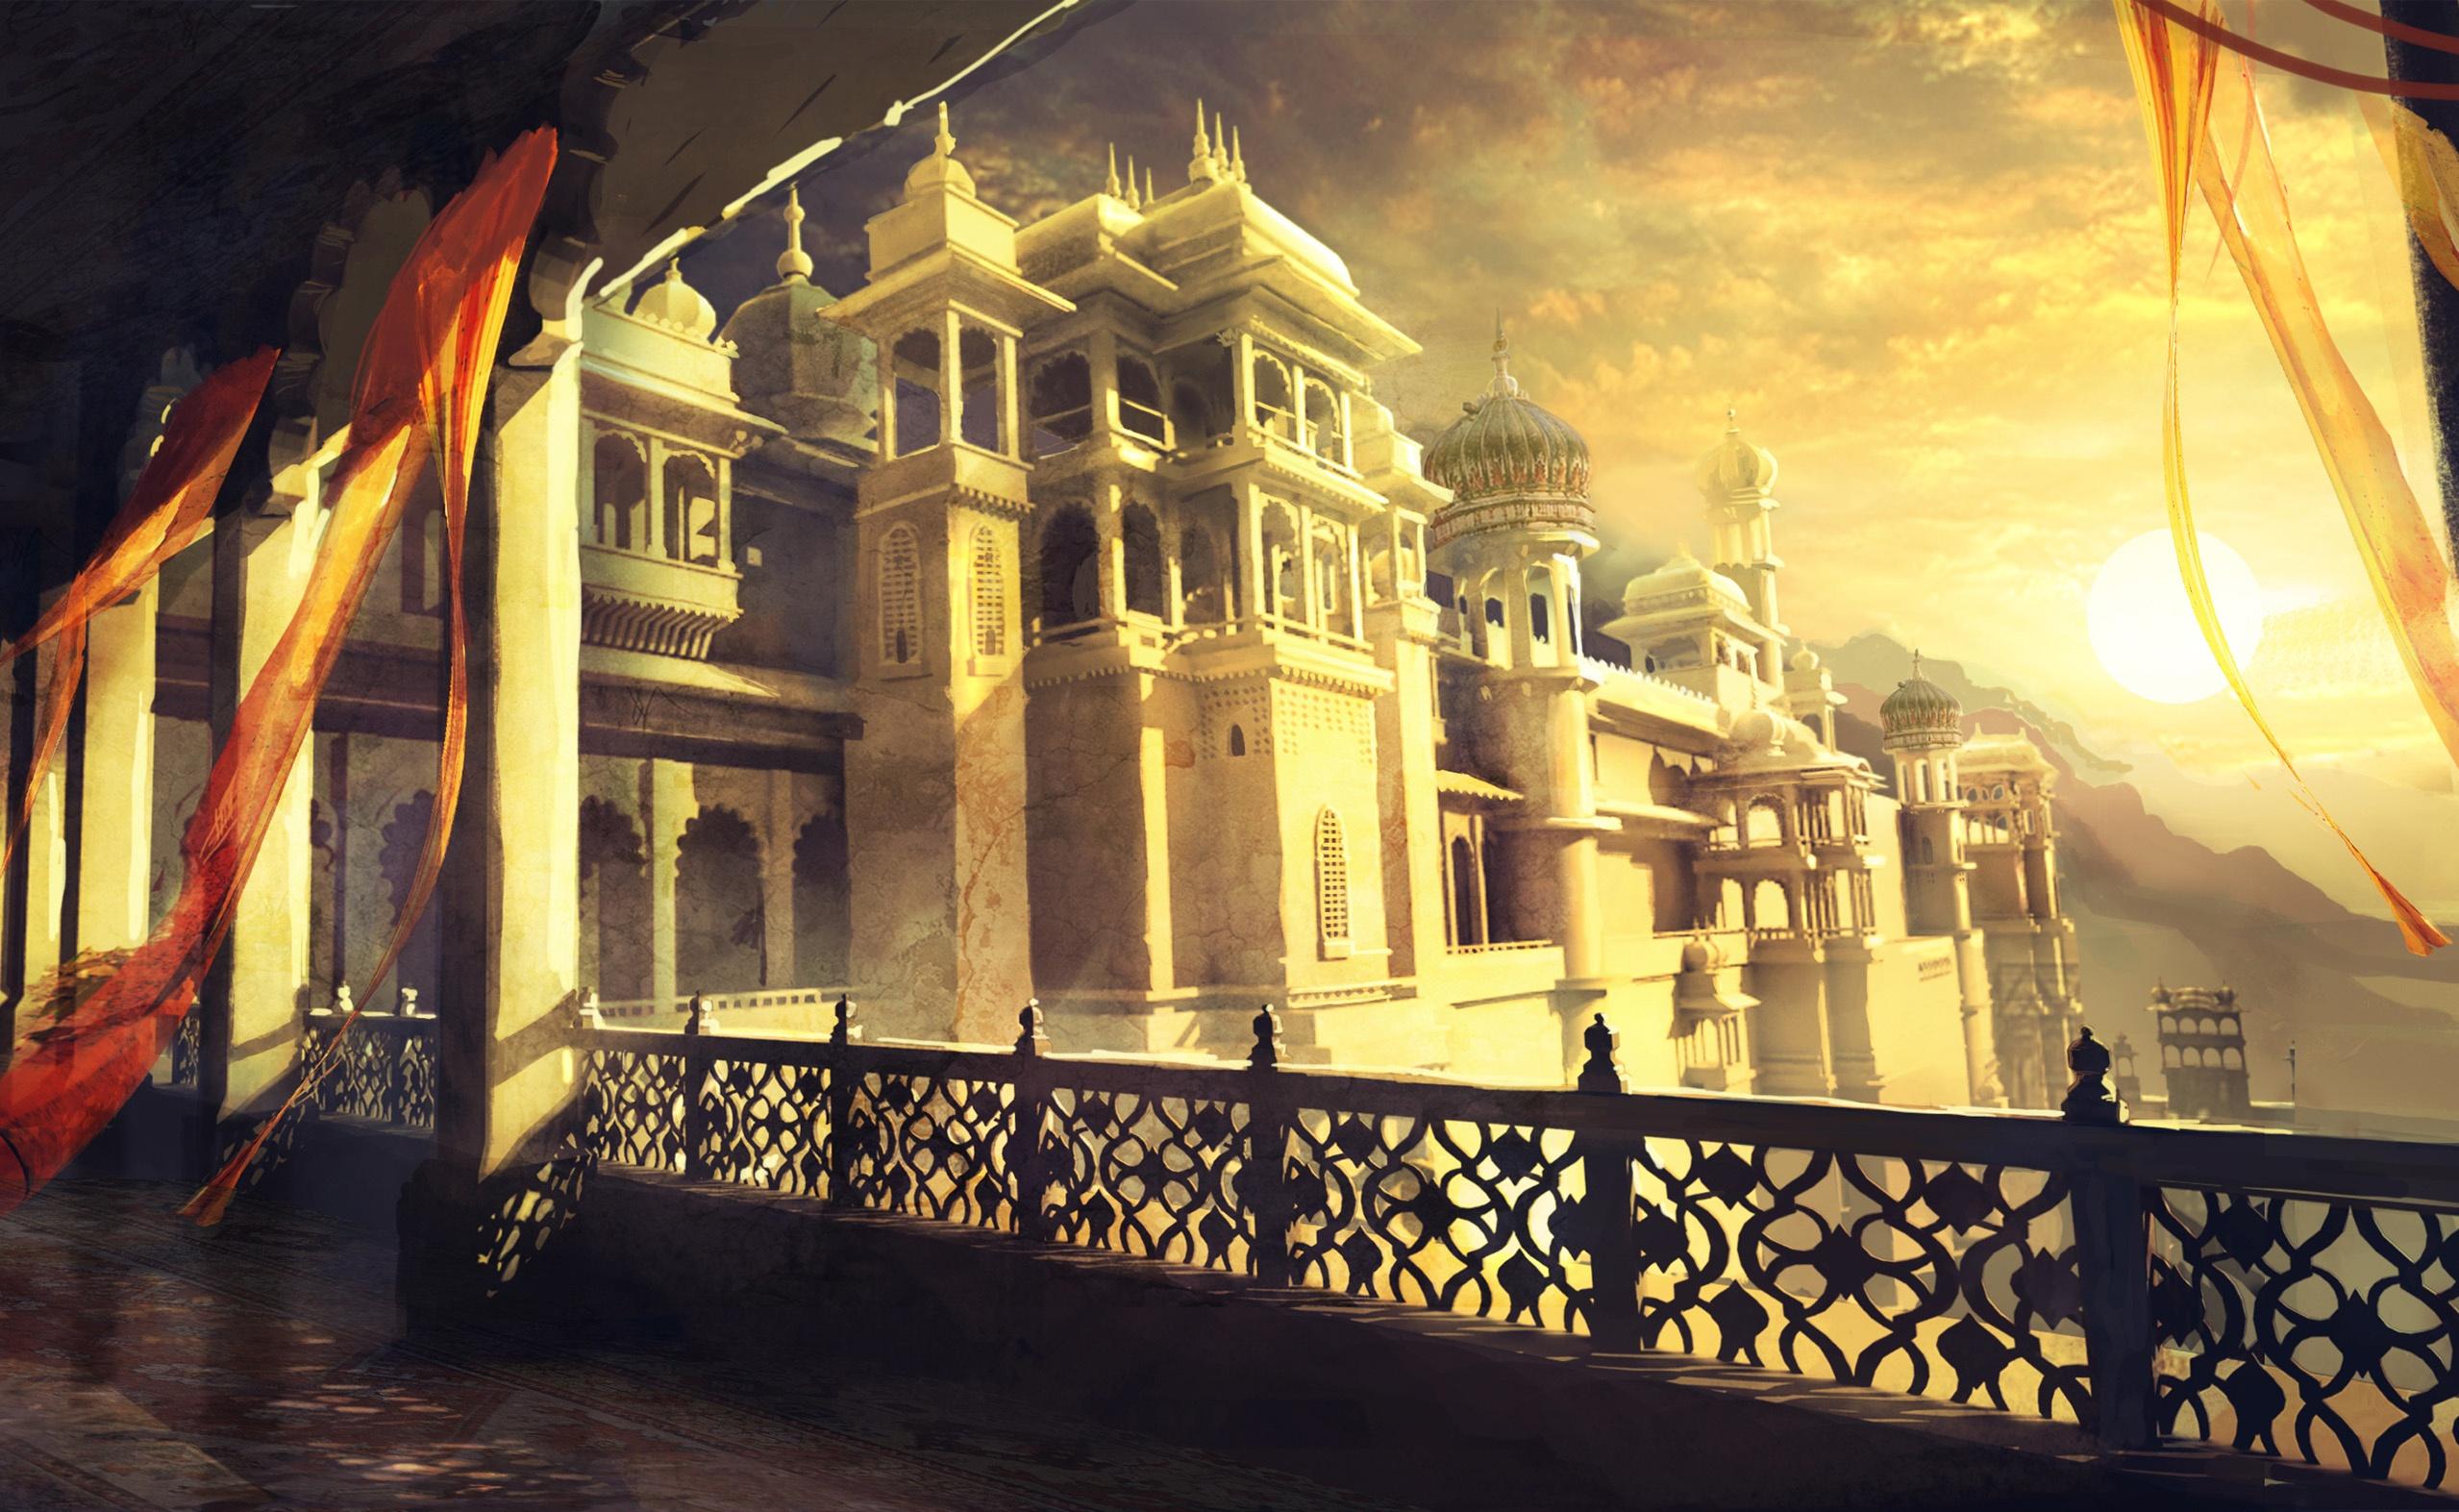 Guru Gobind Singh 3d Wallpapers Prince Of Persia The Forgotten Sands Hd Wallpaper